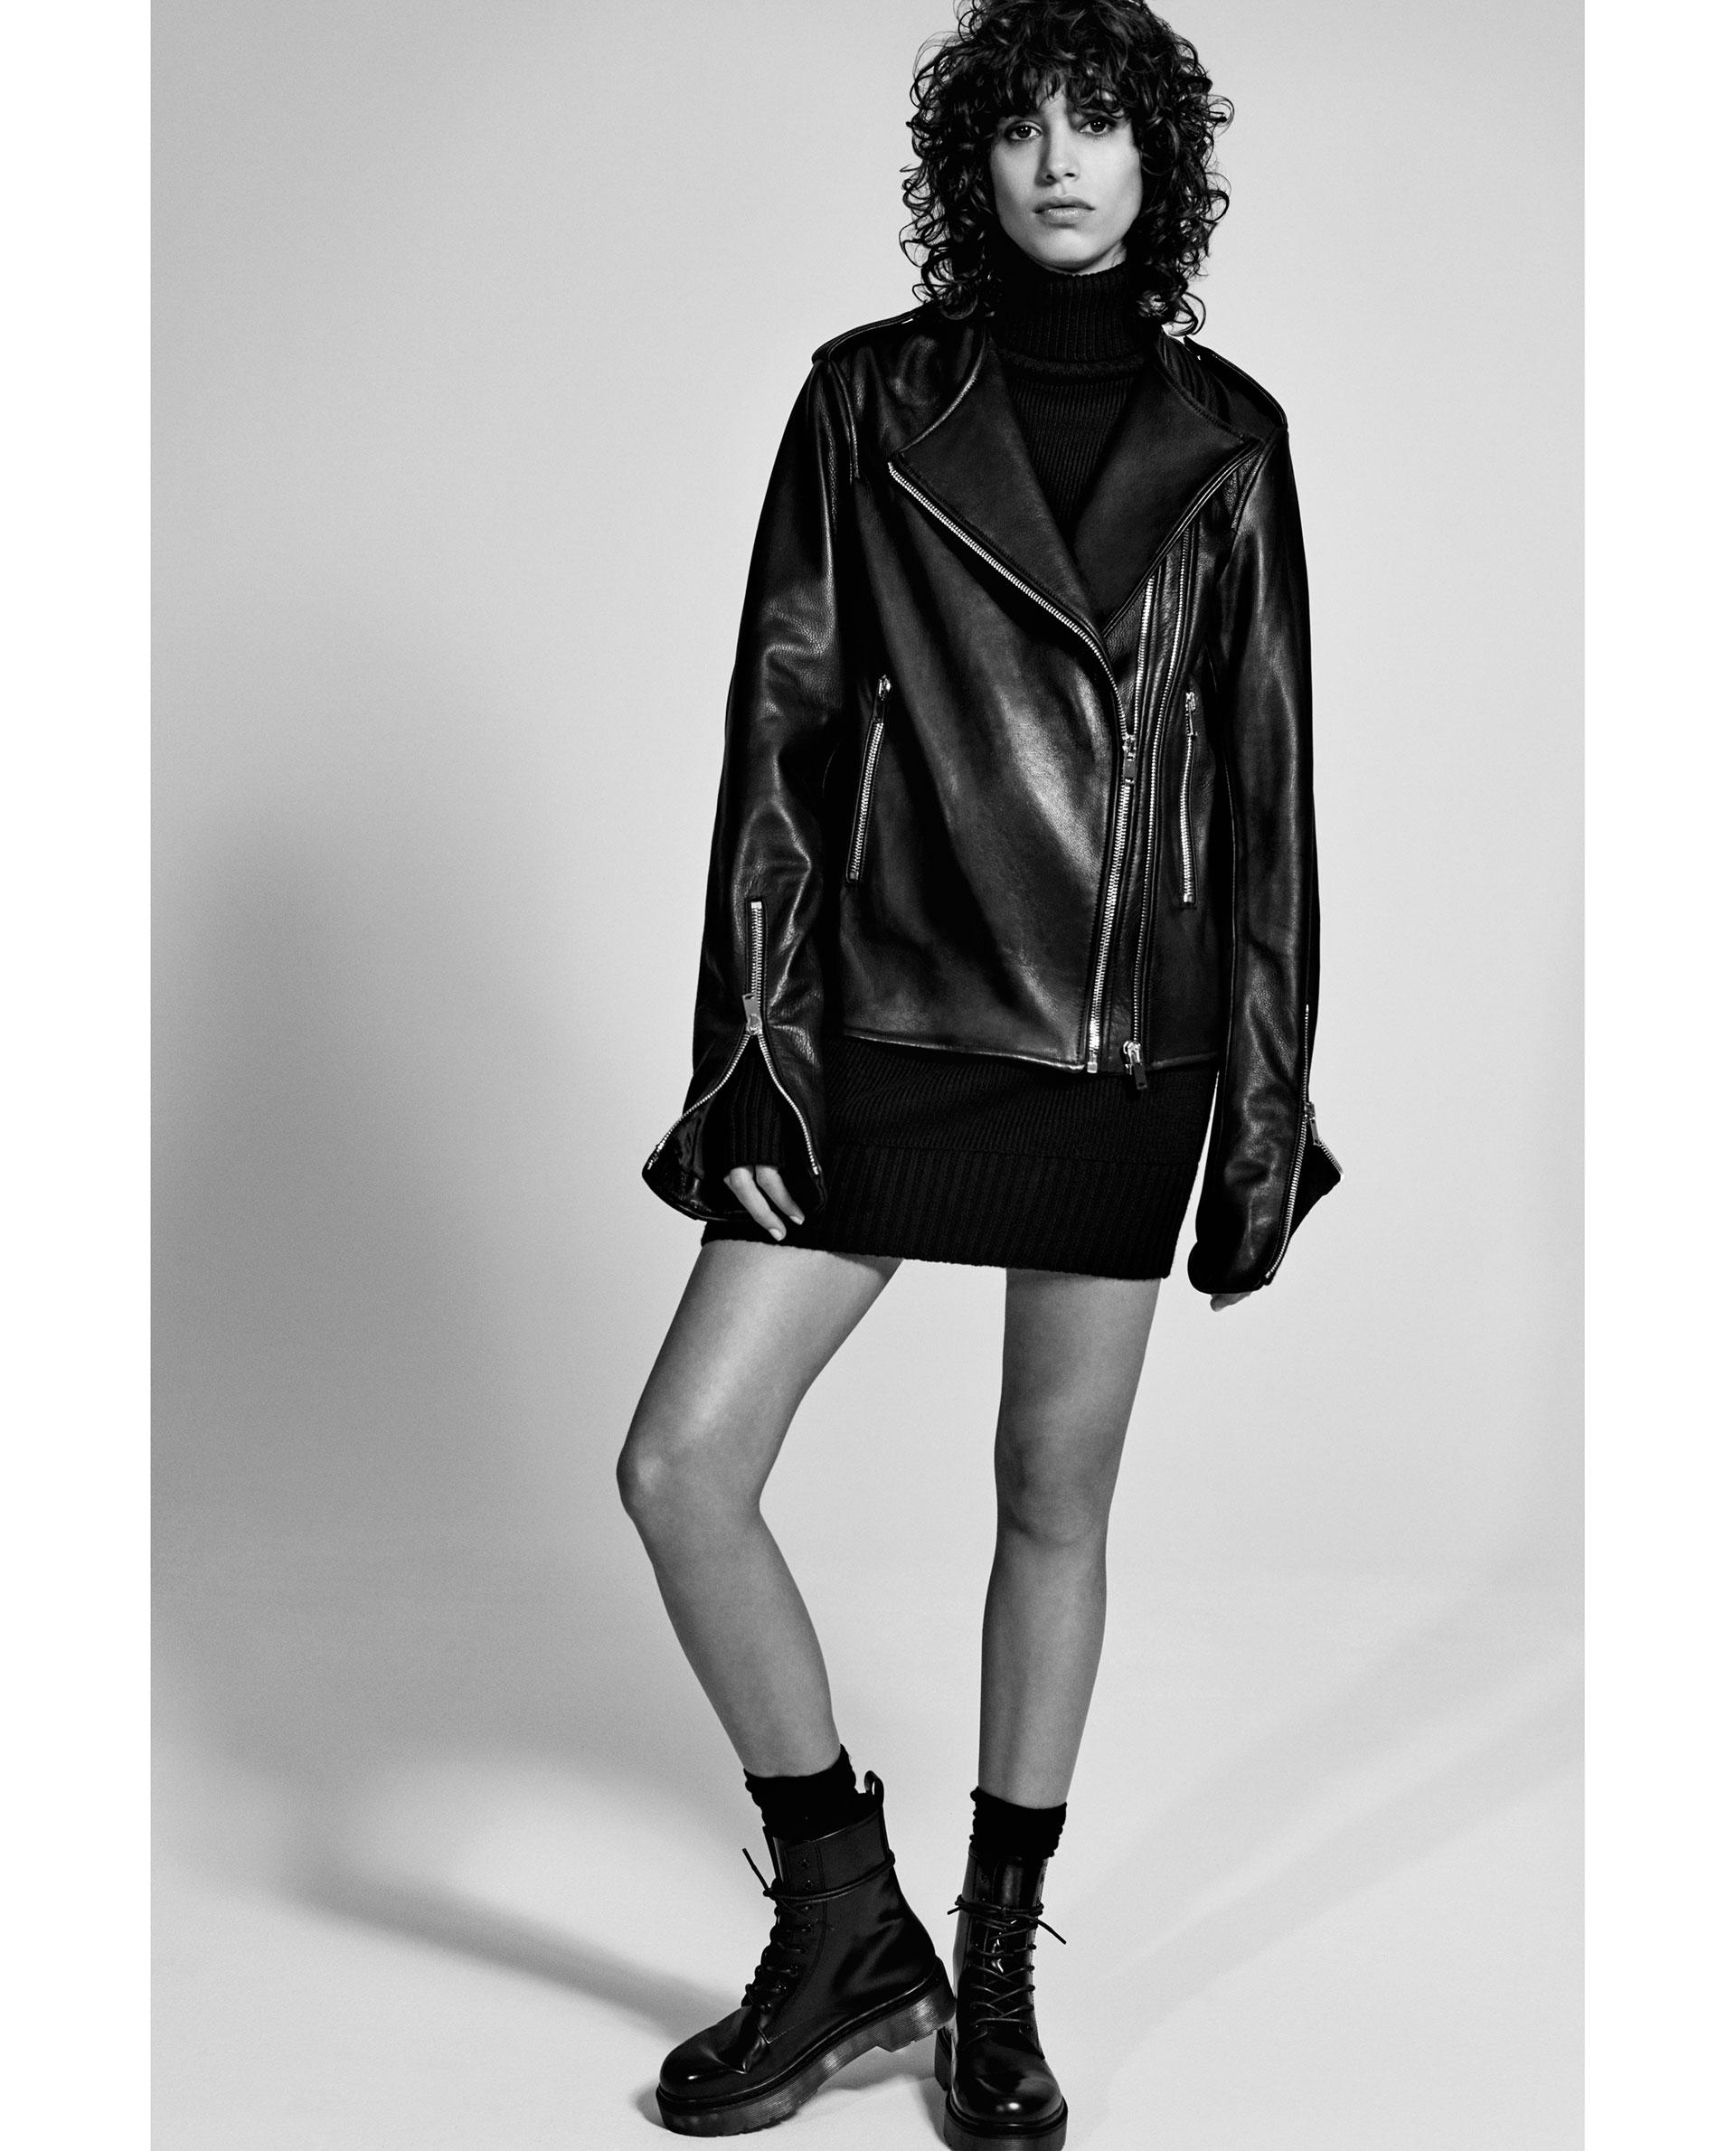 Zara Leather Studio Jacket | Lyst